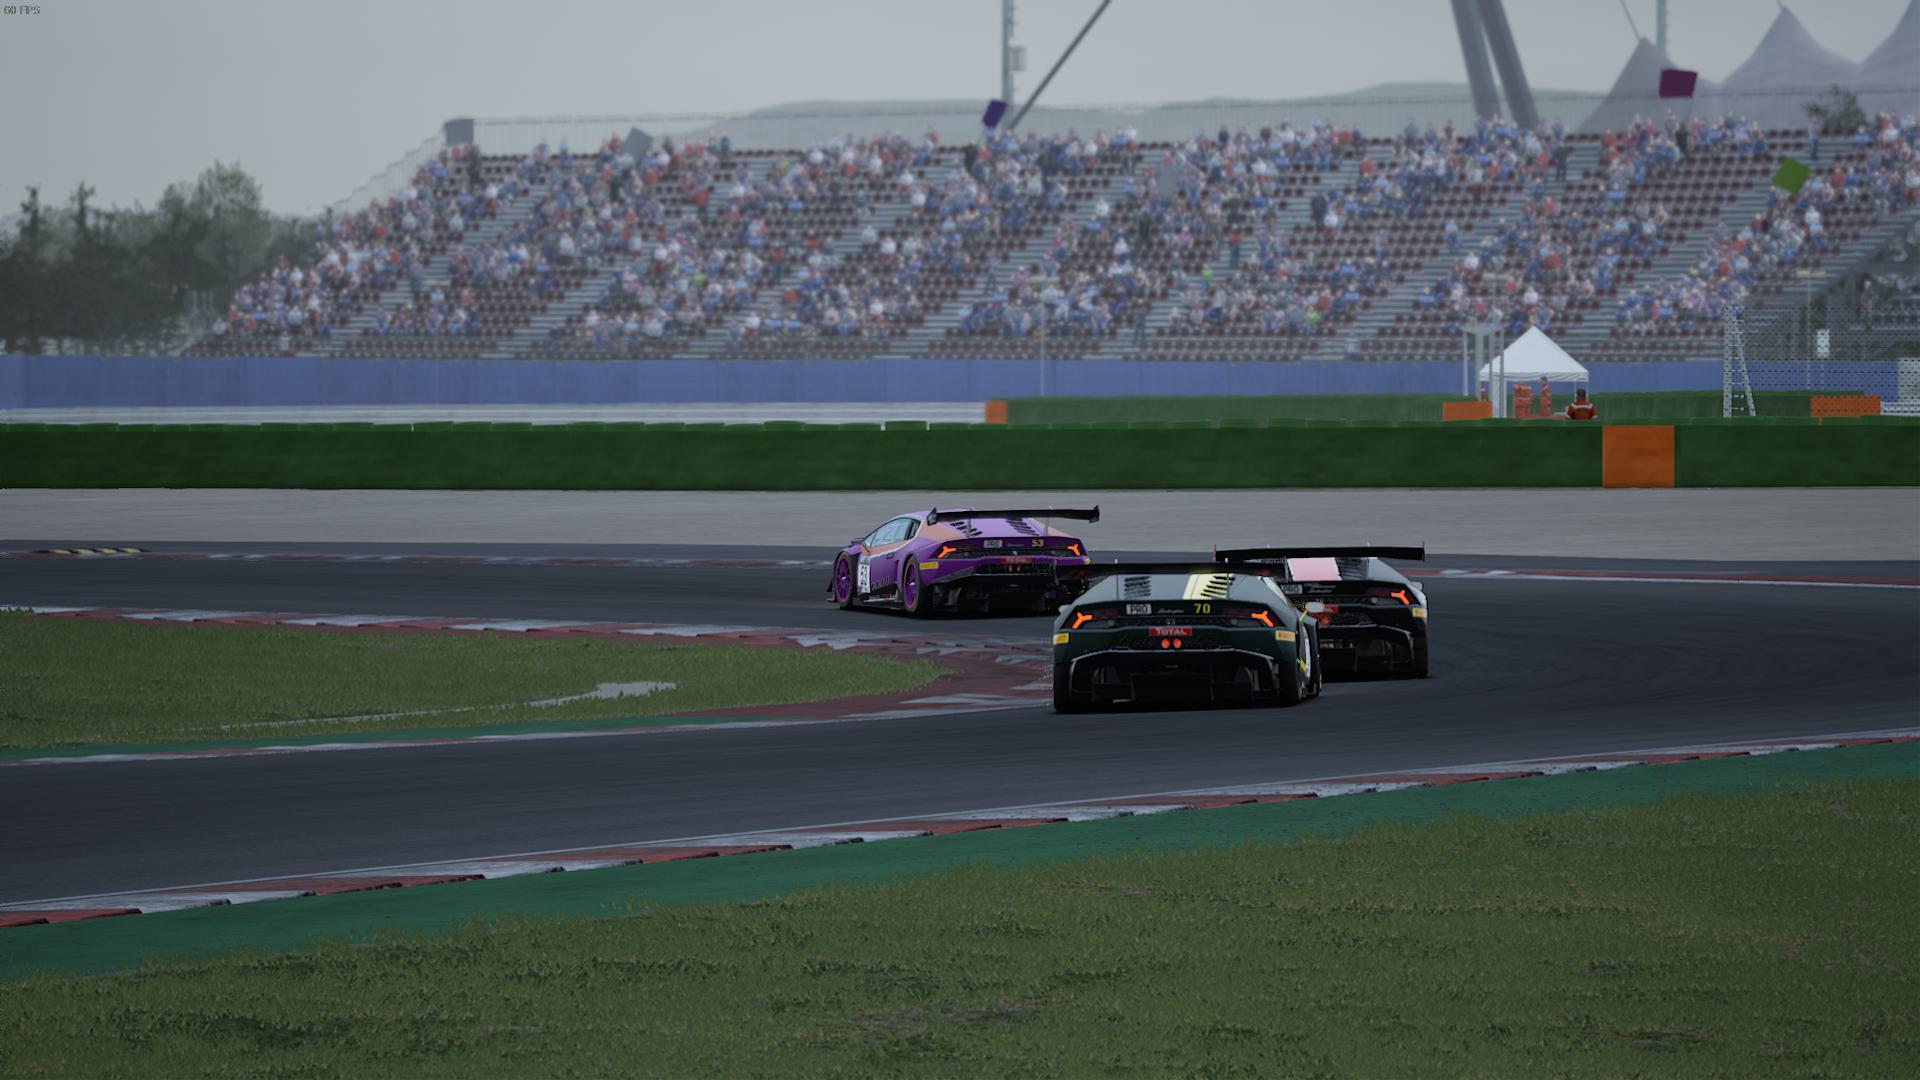 Assetto Corsa Competizione Screenshot 2021.03.13 - 11.42.14.25.png